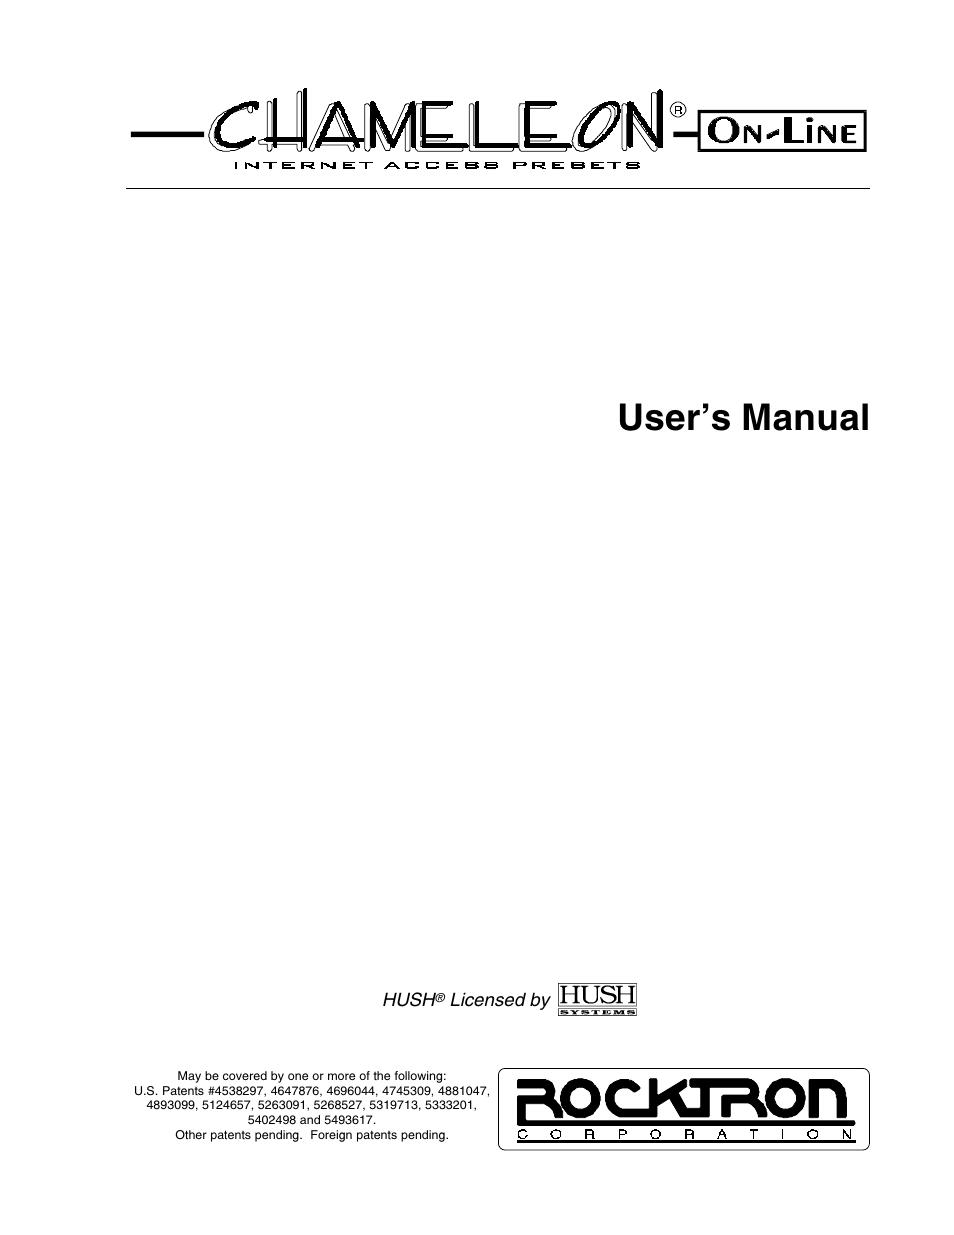 rocktron chameleon on line user manual 103 pages rh manualsdir com Rocktron Replifex rocktron chameleon manual pdf